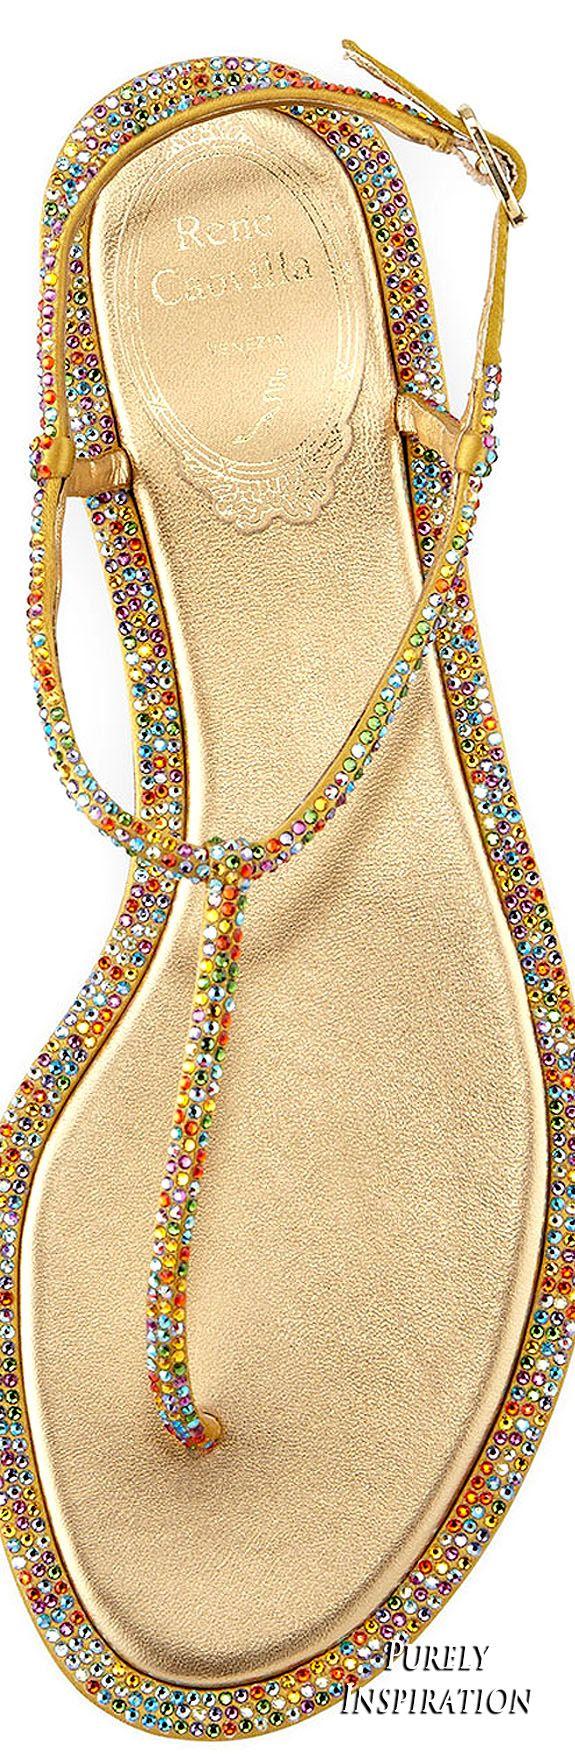 Rene Caovilla Flat Jewel Embellished Thong Sandal | Purely Inspiration